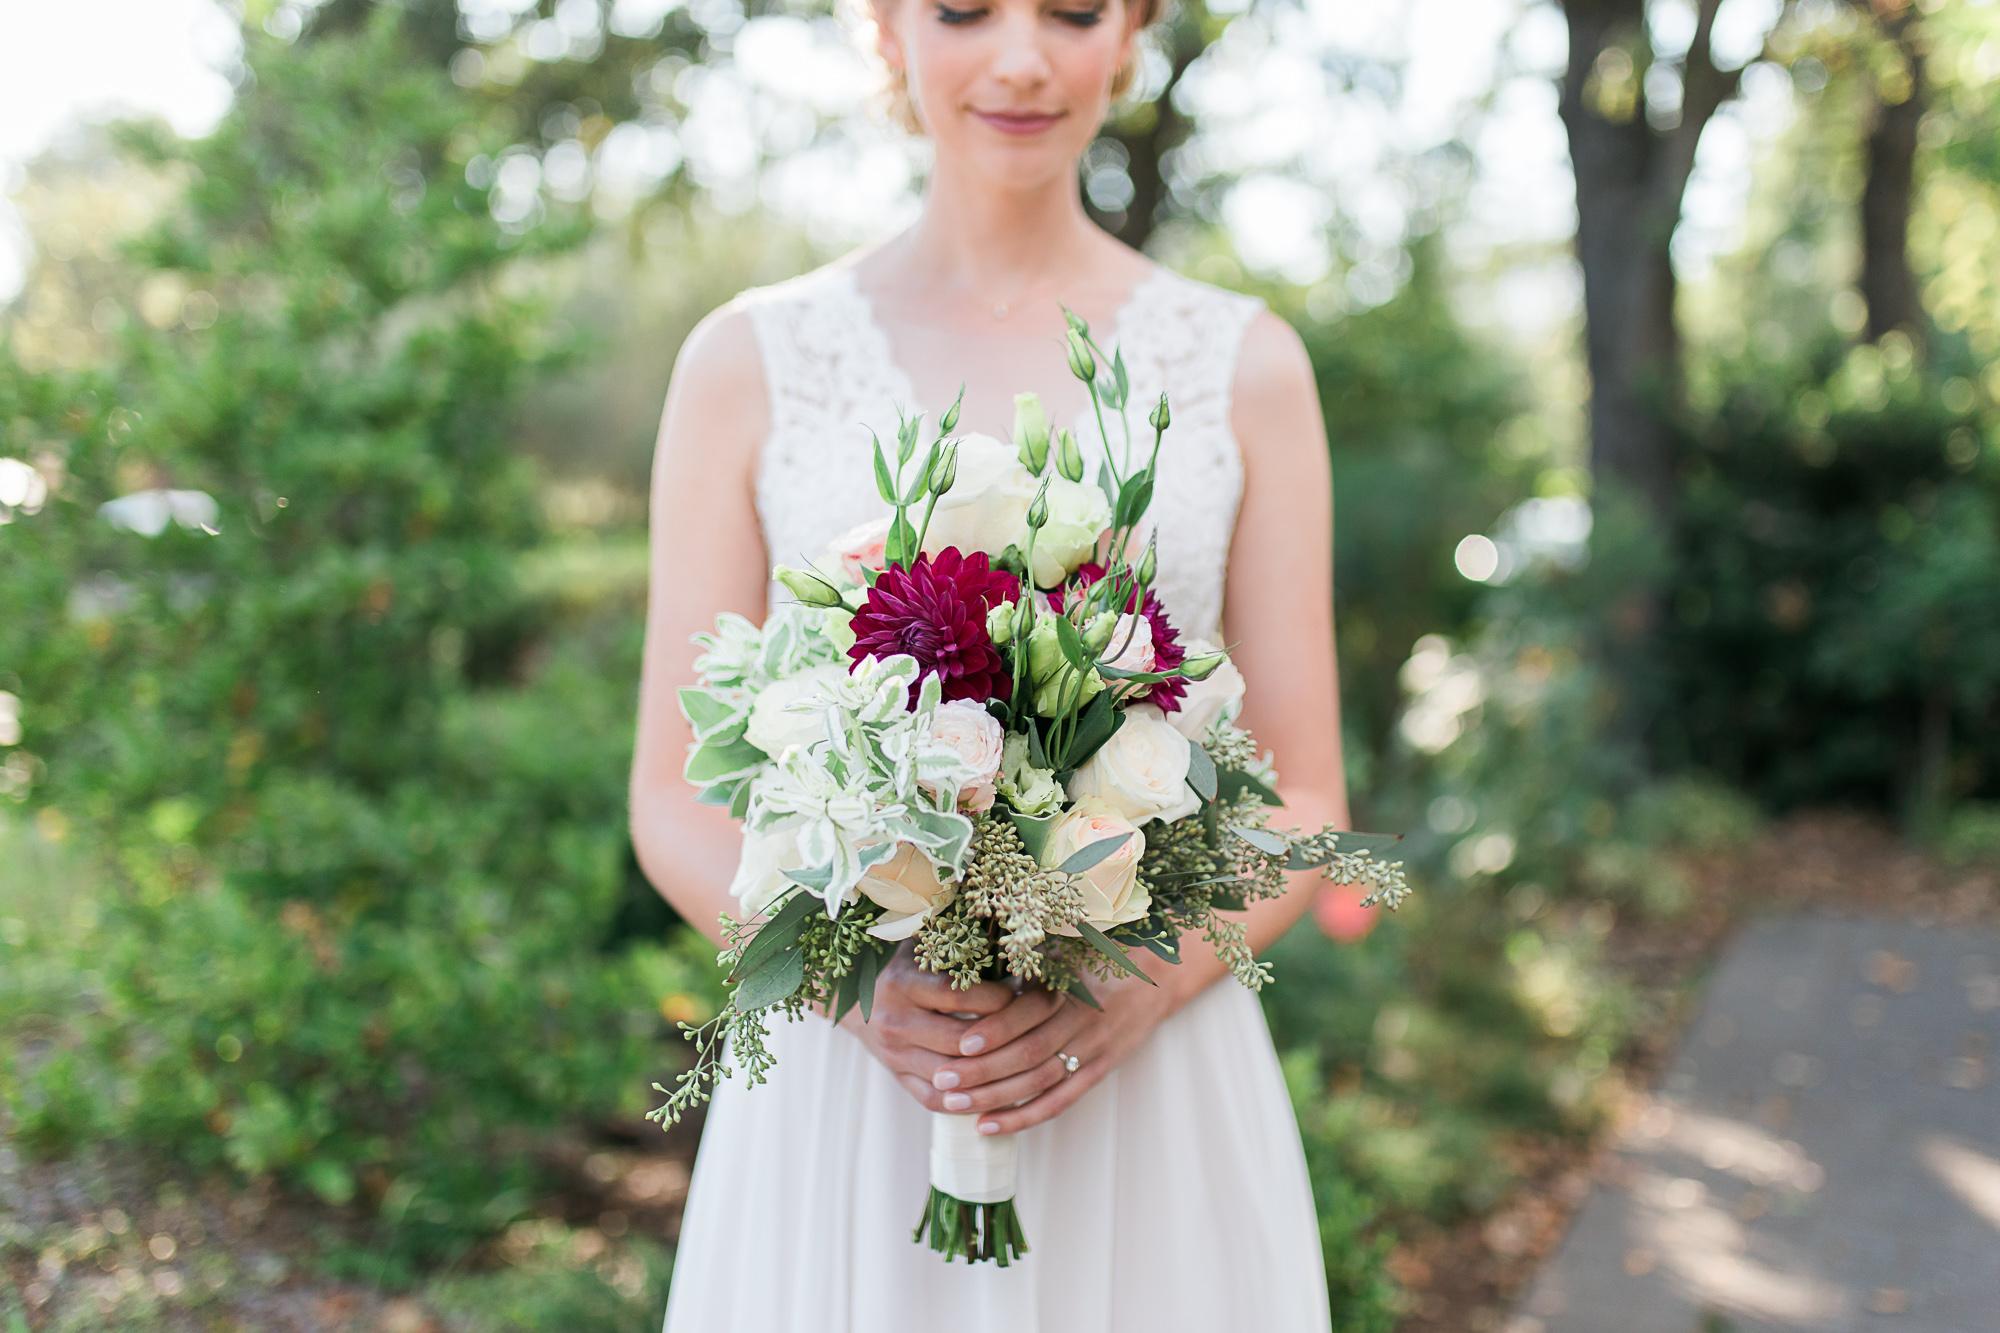 Generals Daughter Wedding Photos by JBJ Pictures - Ramekins Wedding Venue Photographer in Sonoma, Napa (17).jpg